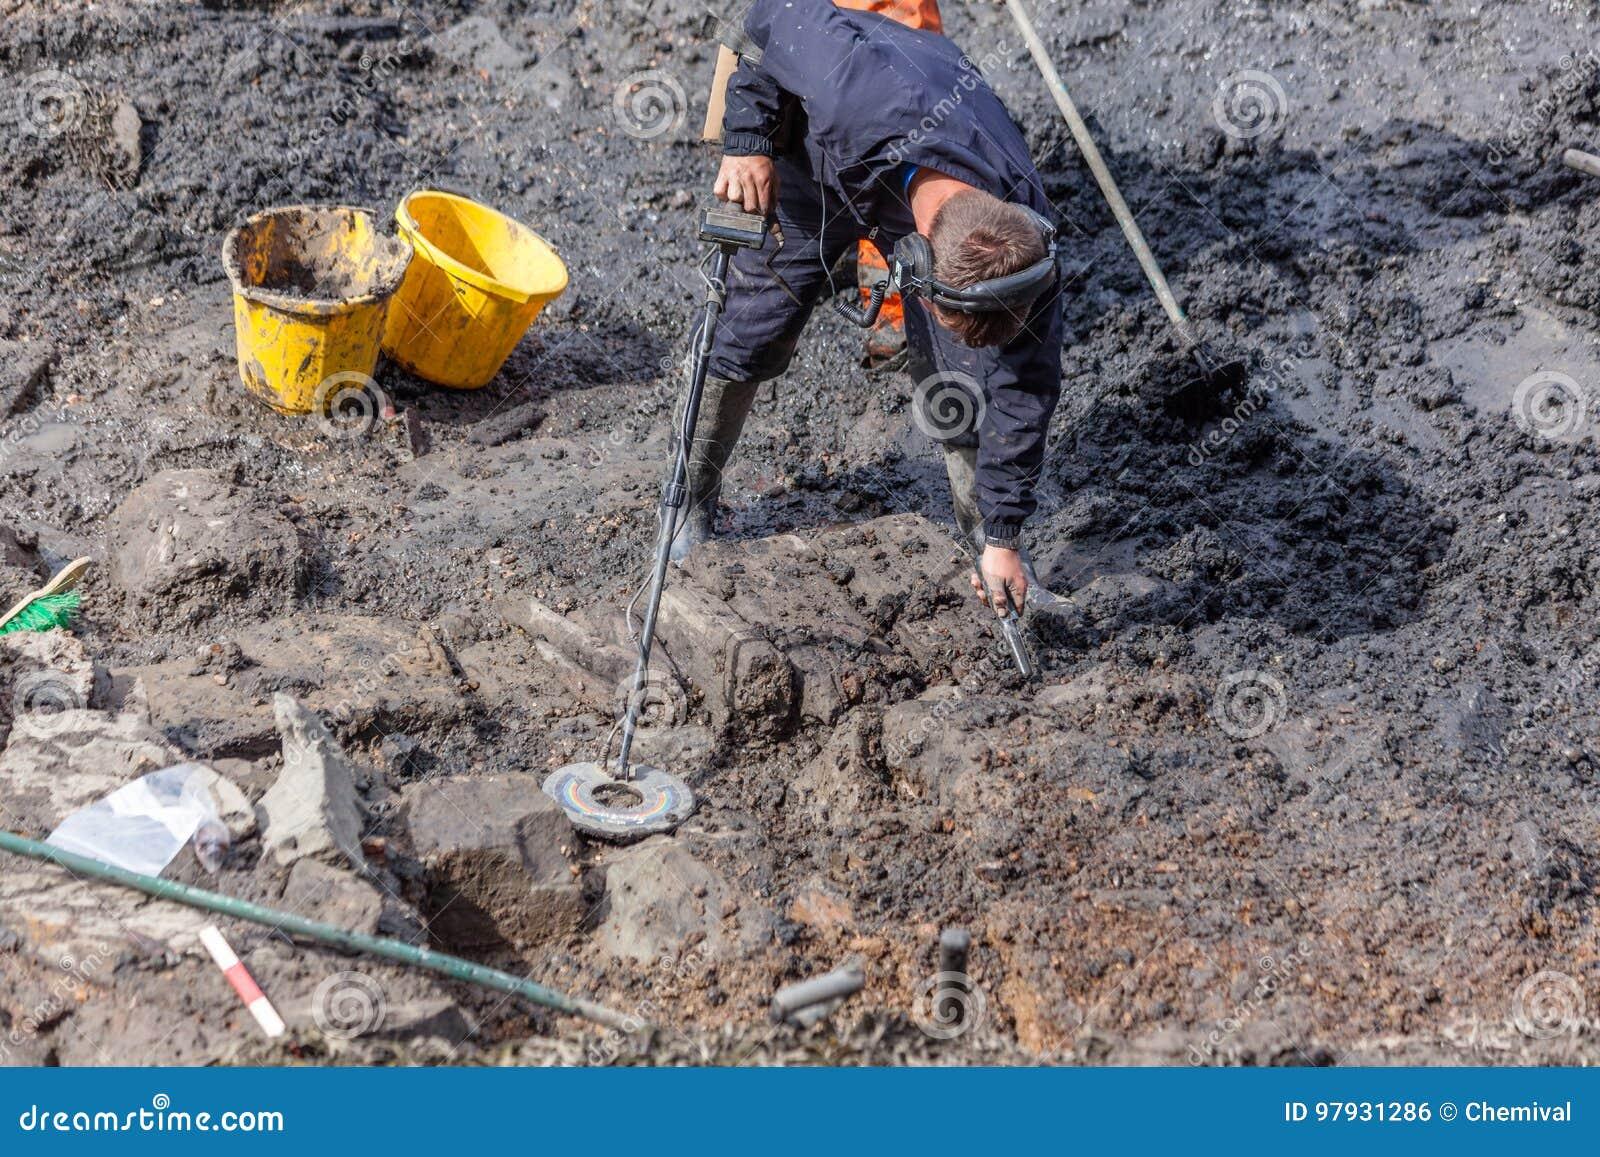 Metal Detectorist at Archaeological Dig